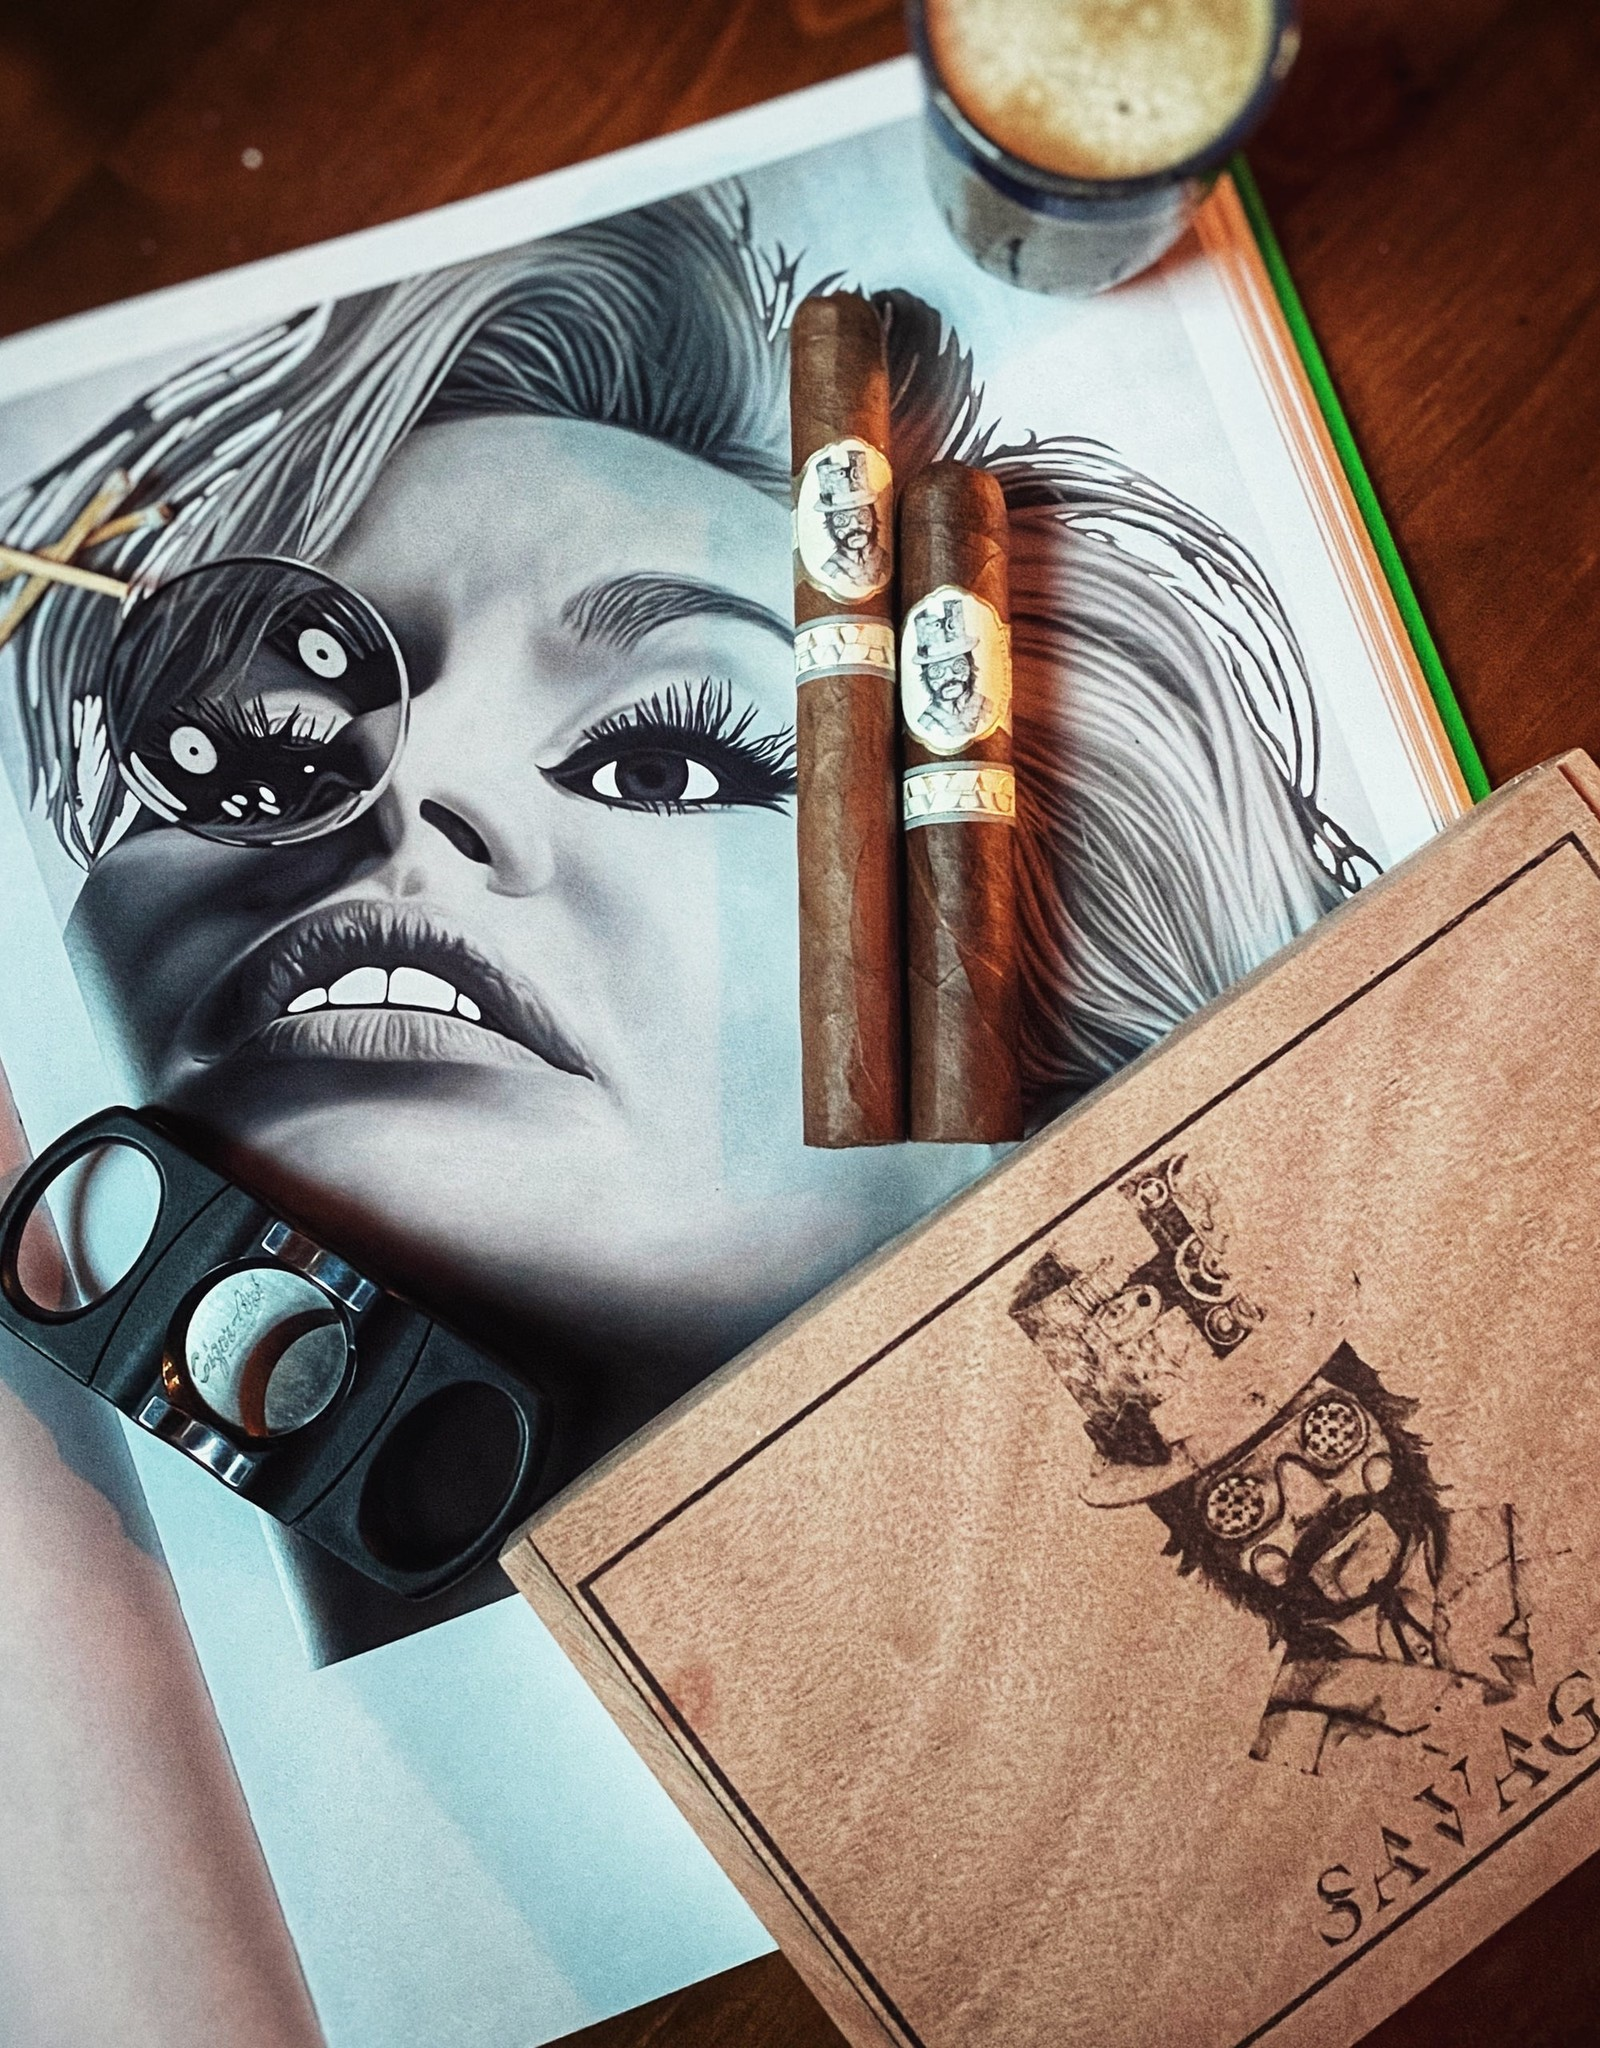 Caldwell Cigar Co Caldwell Savages Super Rothschild 4.75 x 52 Single